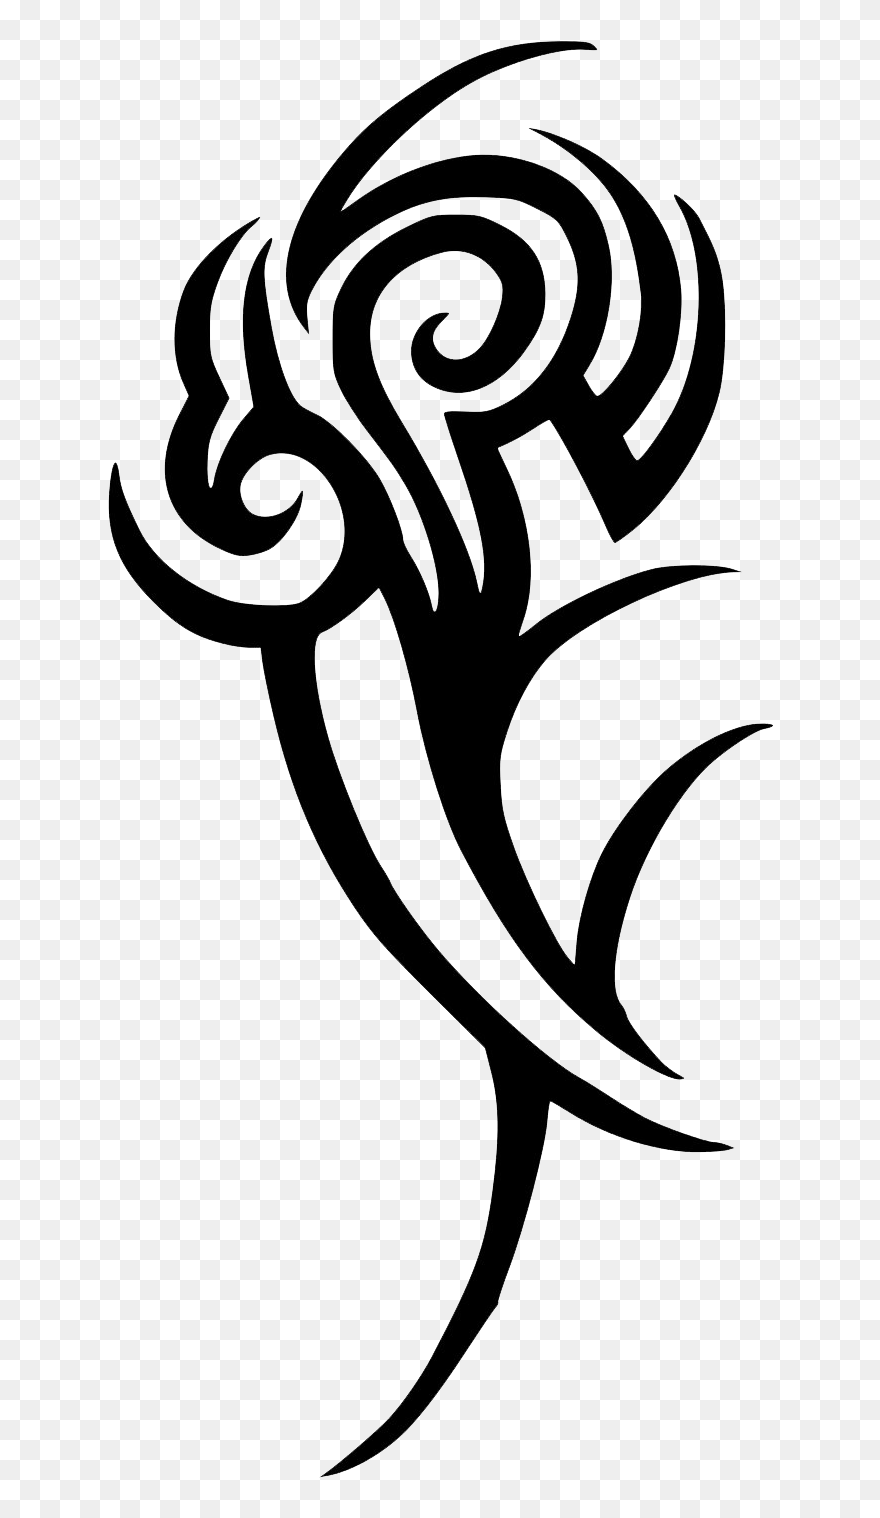 Tribal Tattoo Png : tribal, tattoo, Tribal, Tattoos, Transparent, Photo, Tattoo, Design, Clipart, (#5556584), PinClipart